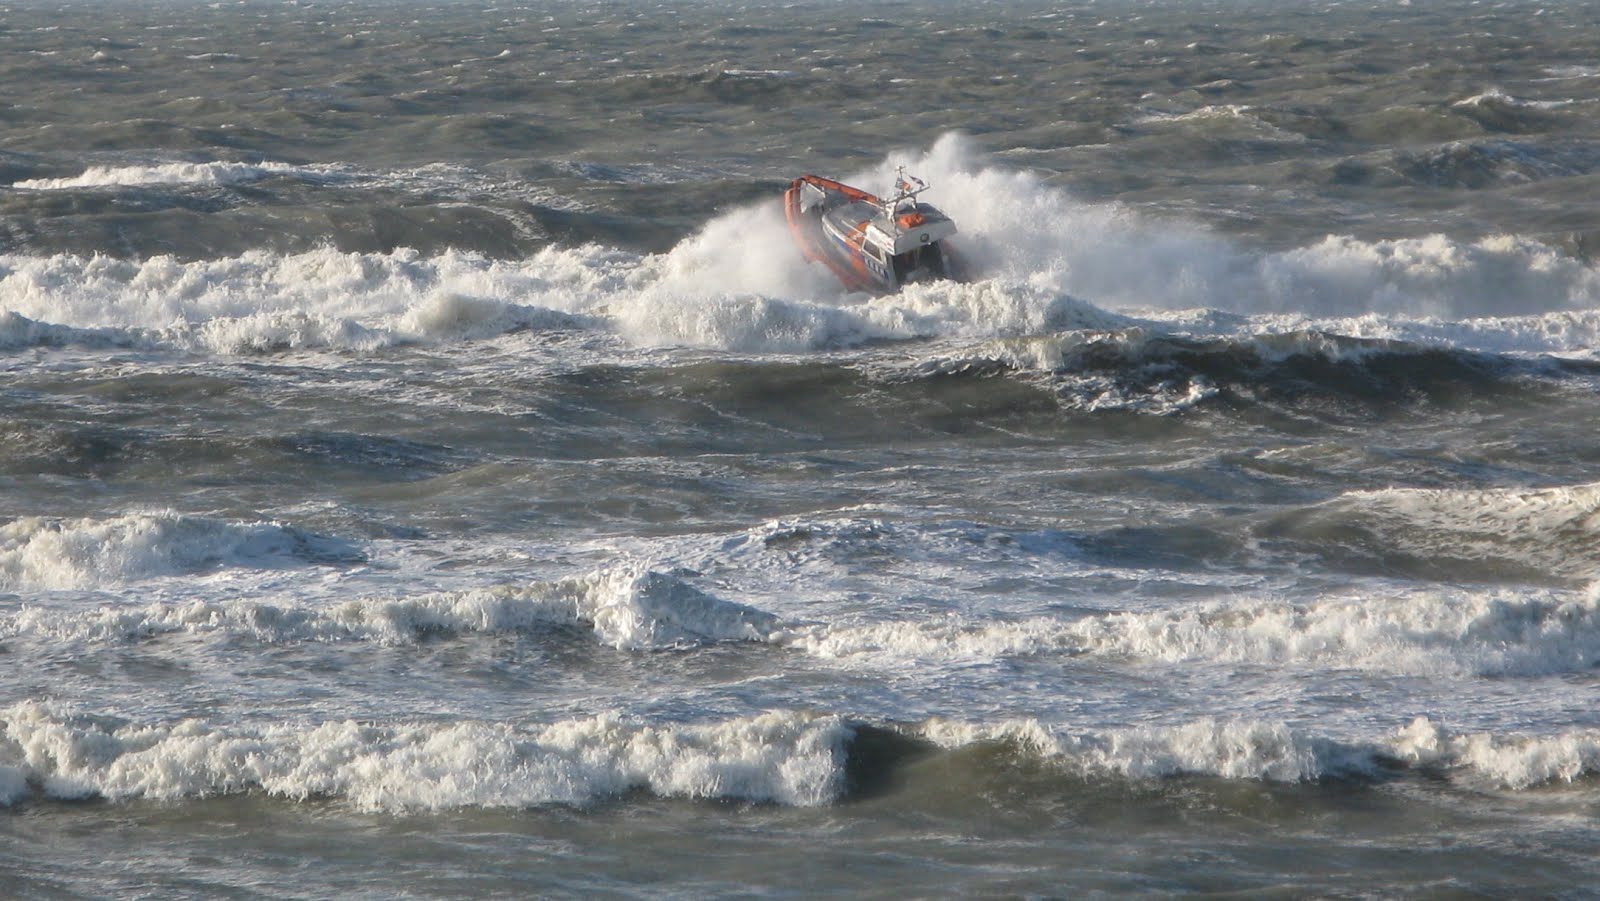 Reddingsboot De Redder